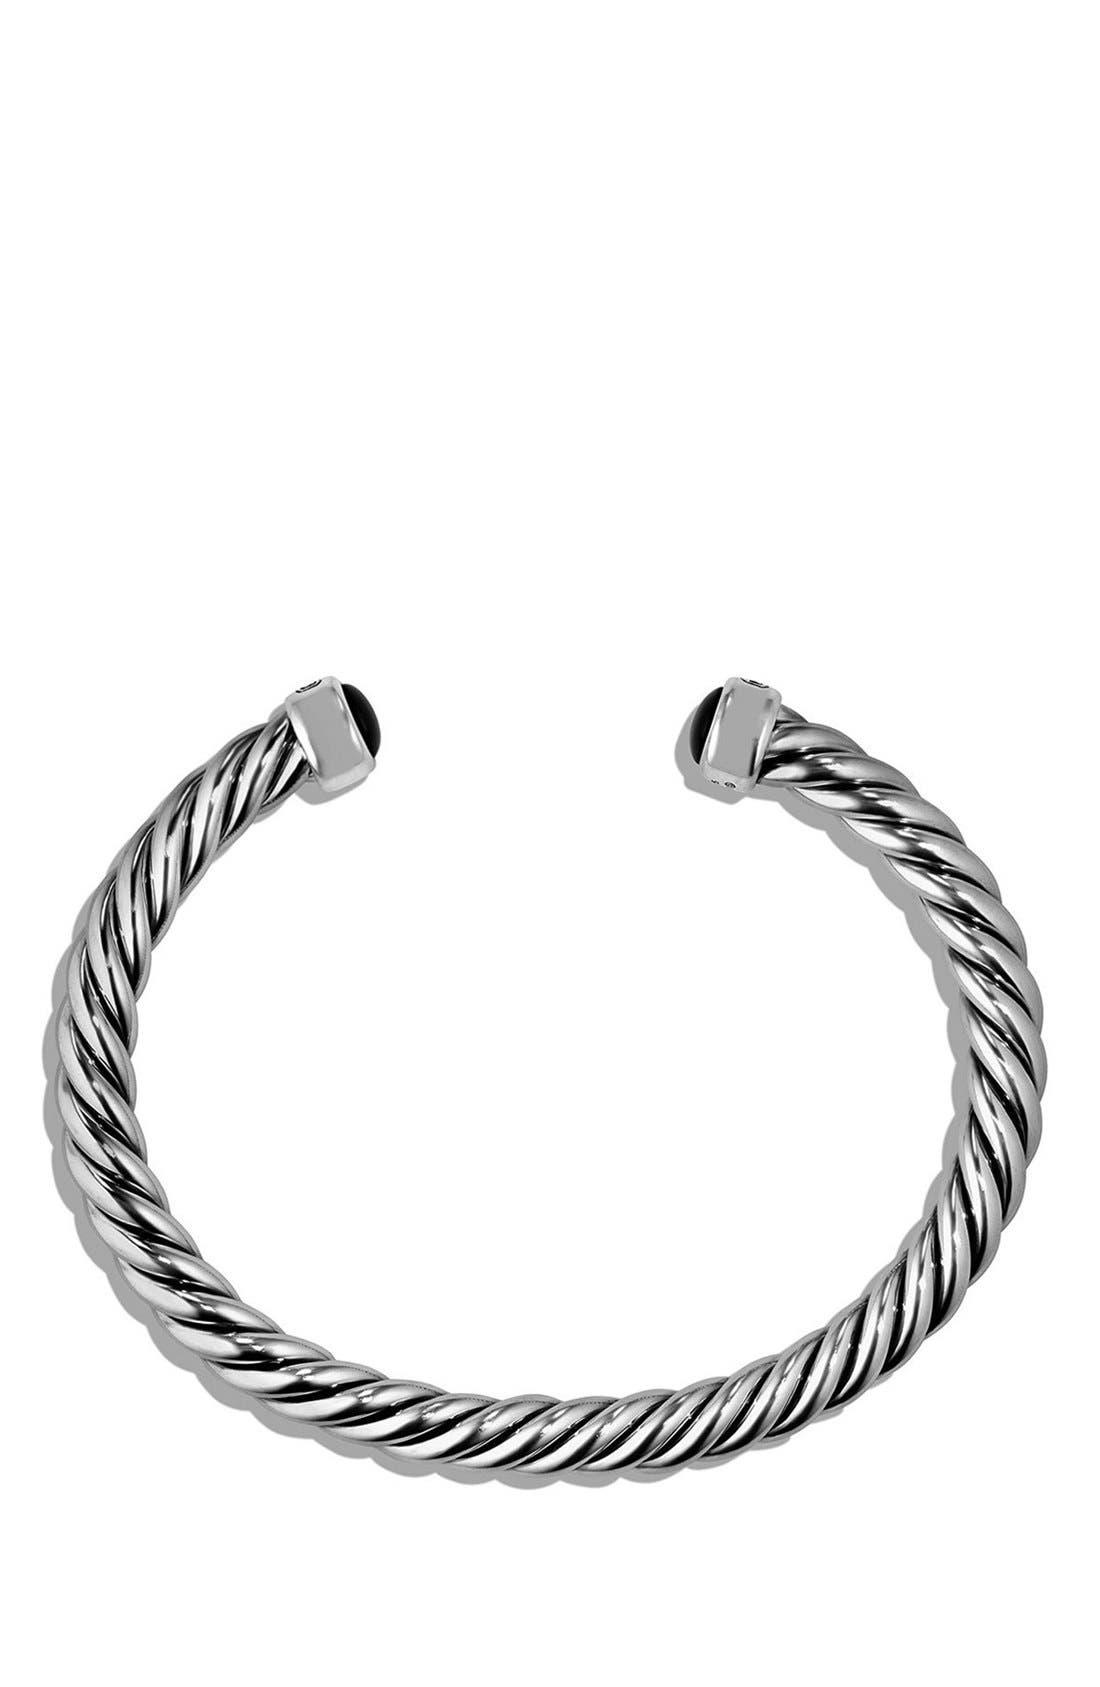 'Cable Classics' Cuff Bracelet,                             Alternate thumbnail 2, color,                             Silver/ Black Onyx